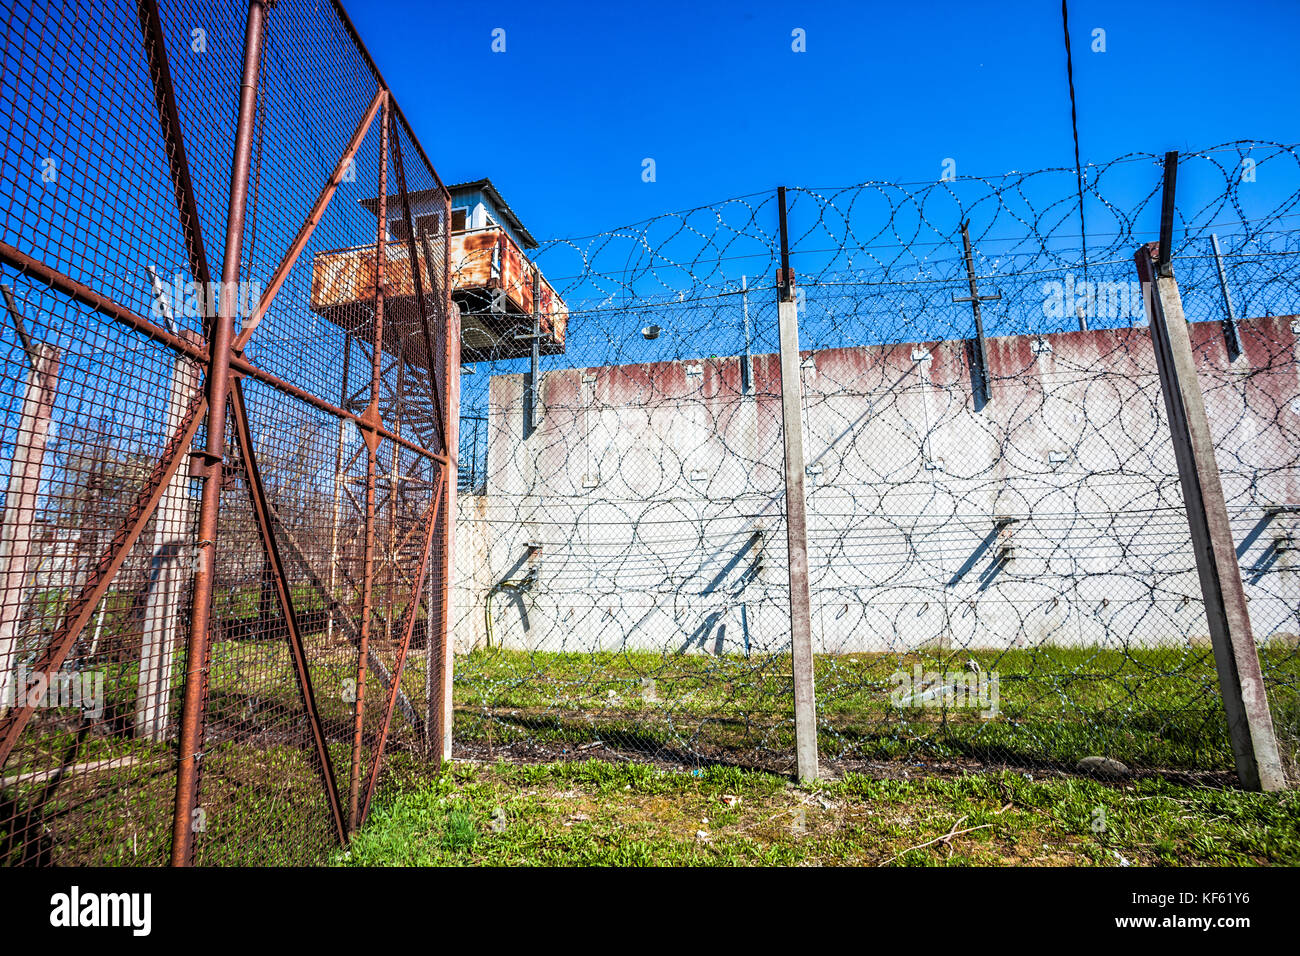 Abandoned Soviet time prison - Stock Image